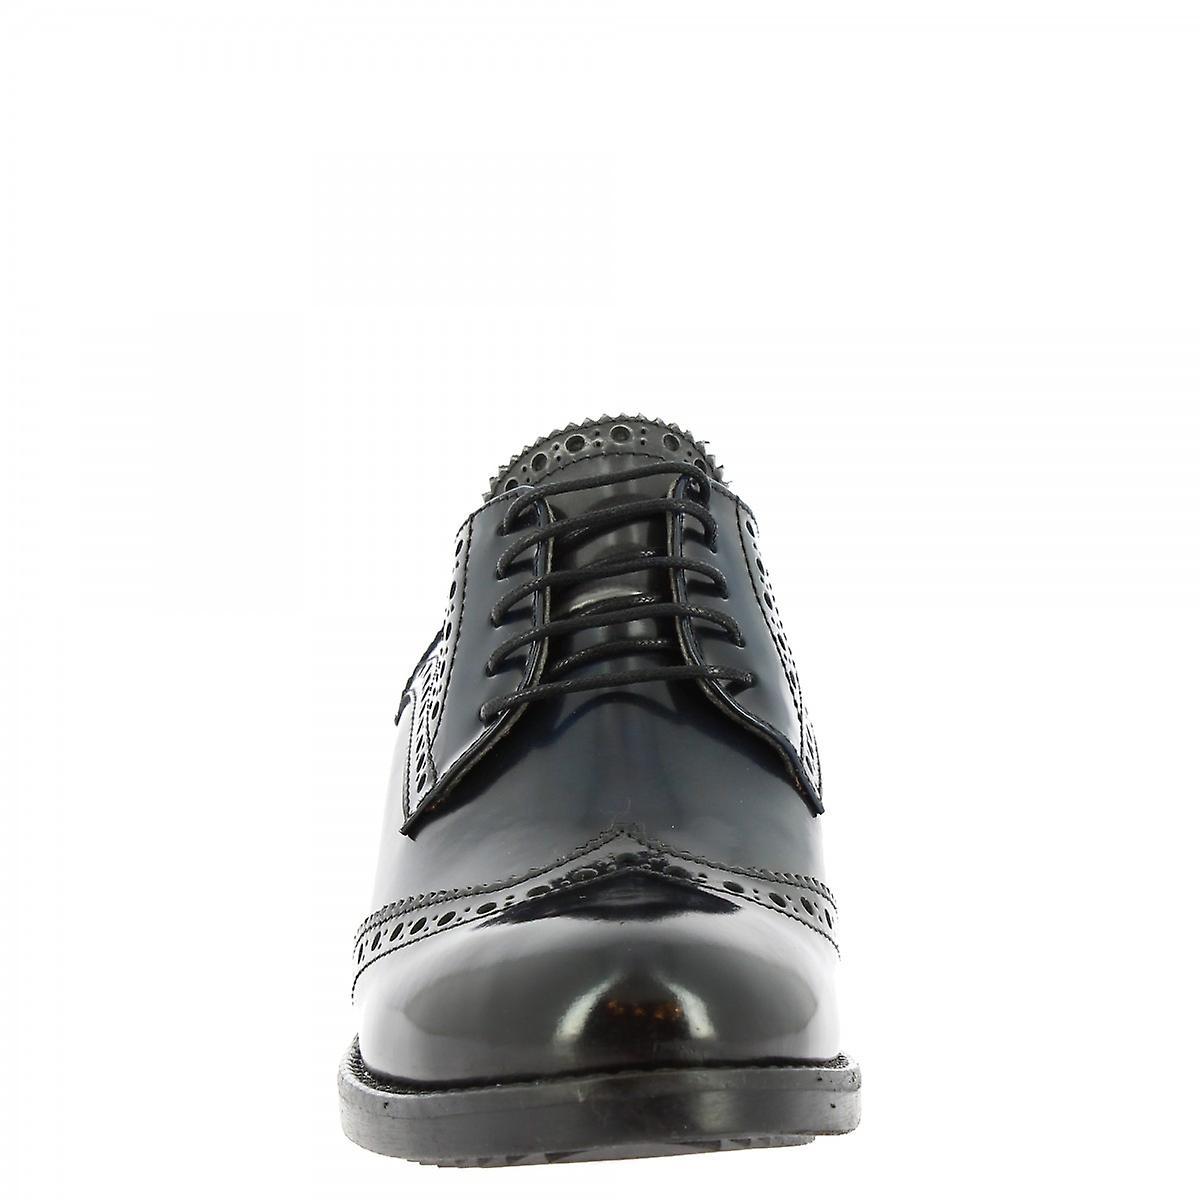 Leonardo Shoes Women's handmade lace-up heel derby shoes dark blue patent leather sJcbT